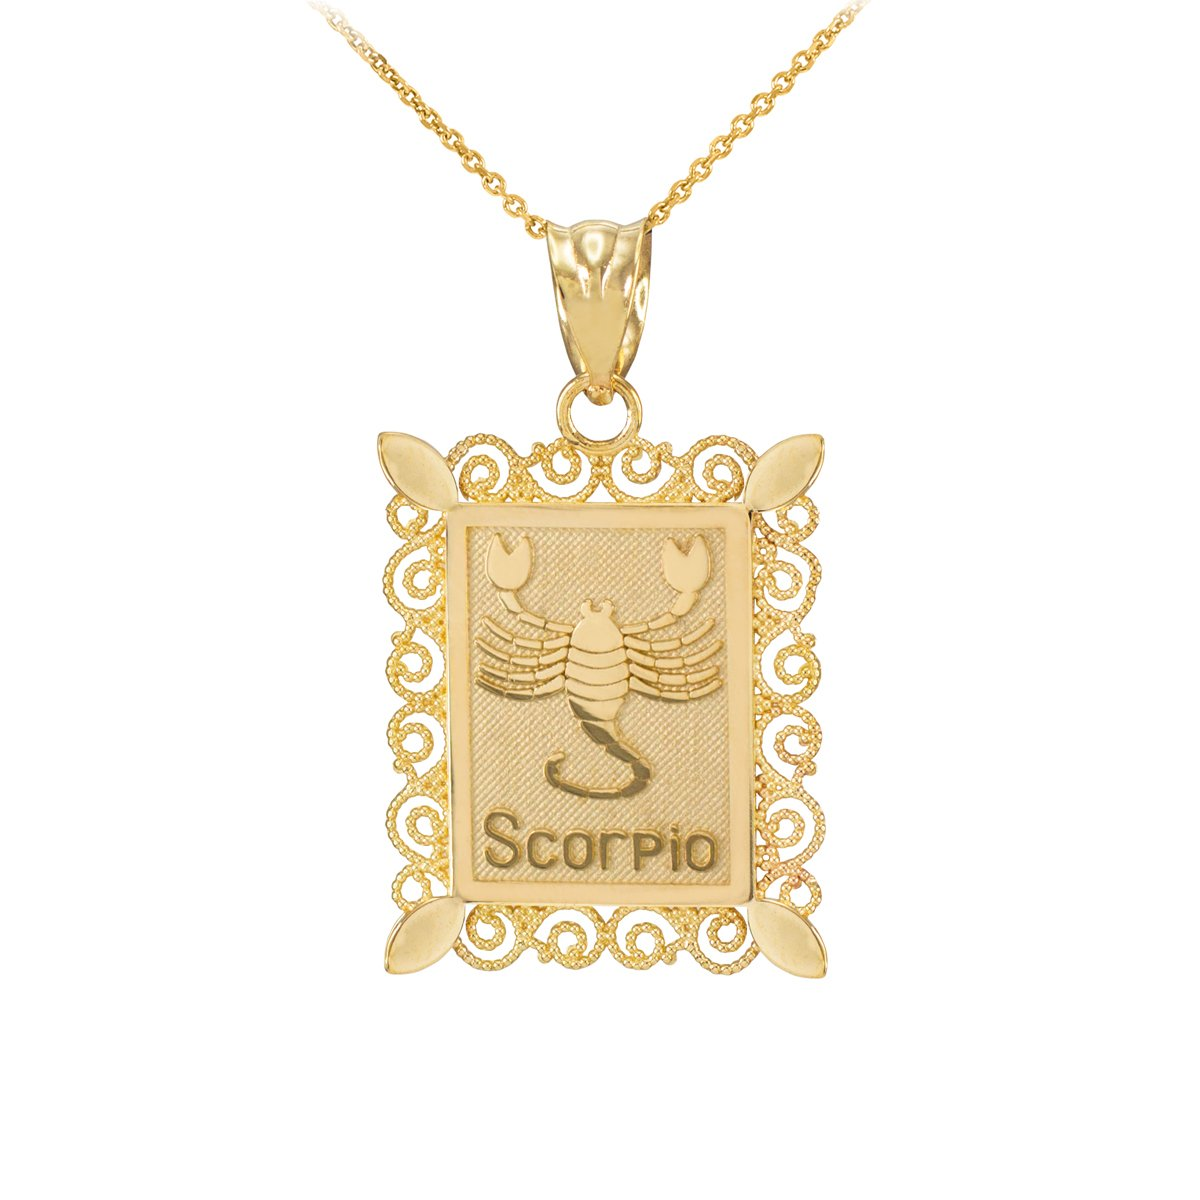 Fine 14k Yellow Gold Filigree-Style Rectangular Frame Scorpio Zodiac Sign Pendant Necklace, 20'' by Astrology Jewelry